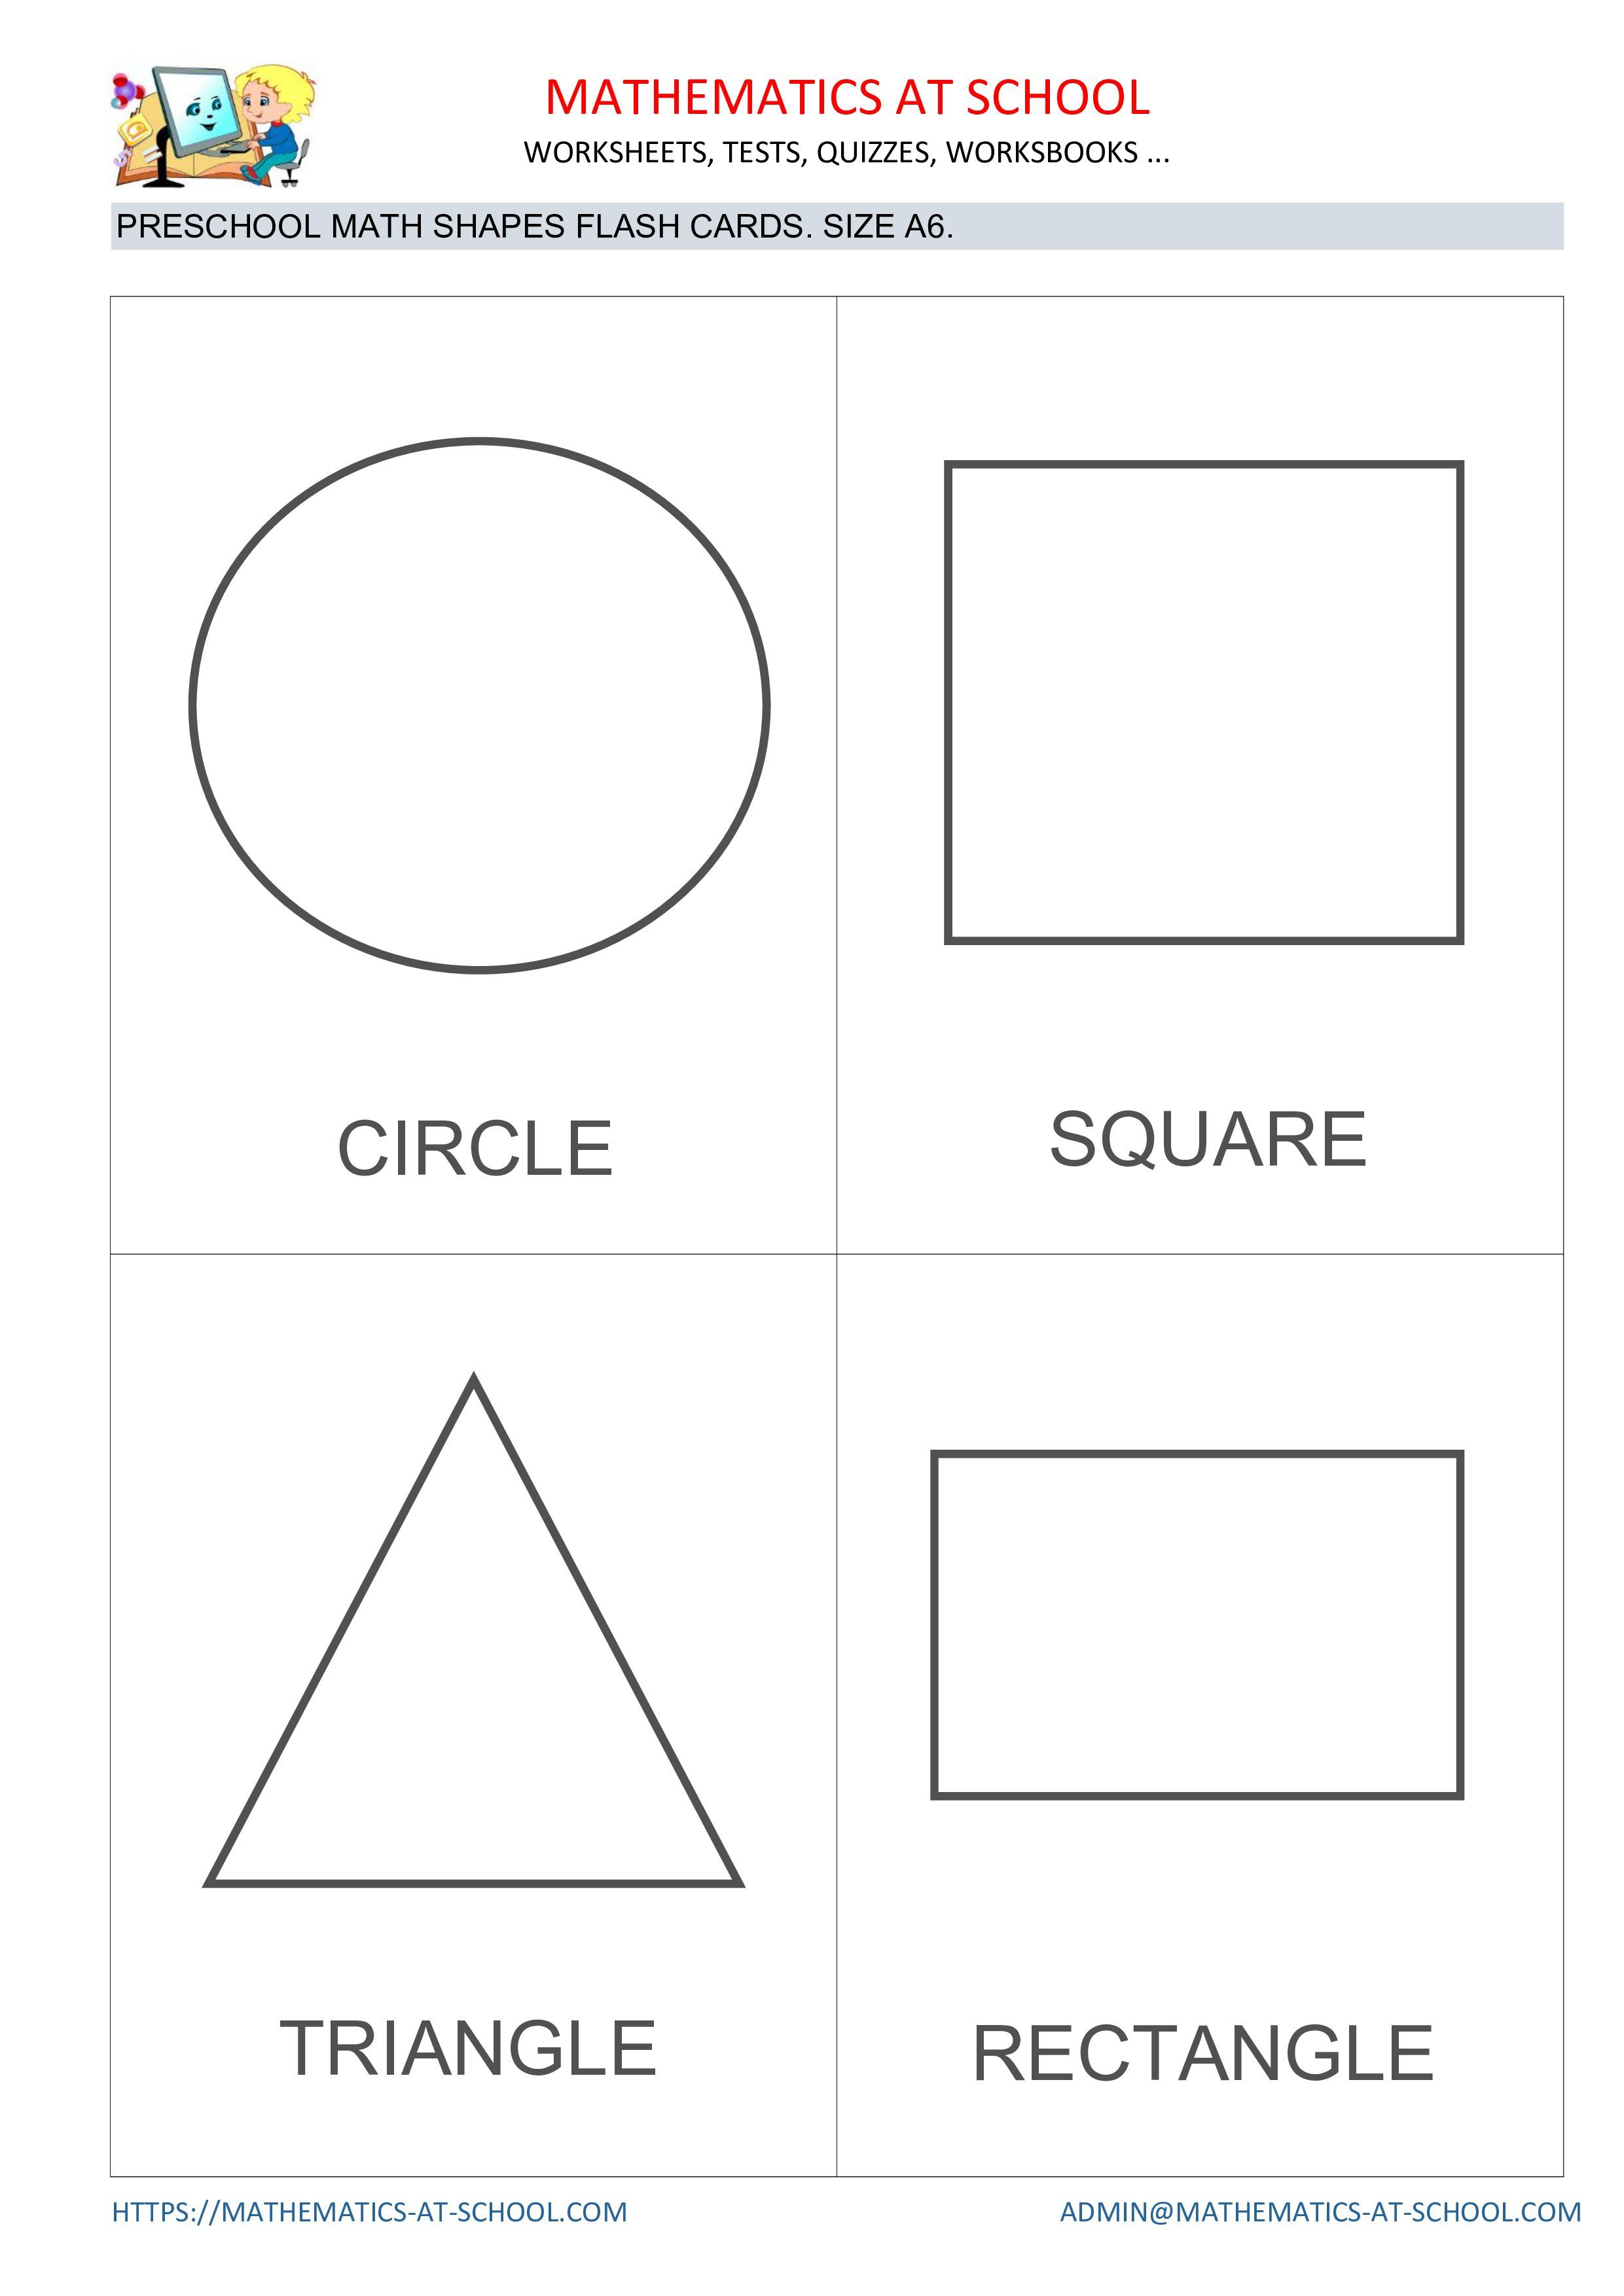 Preschool math shapes flash cards [ 3508 x 2481 Pixel ]